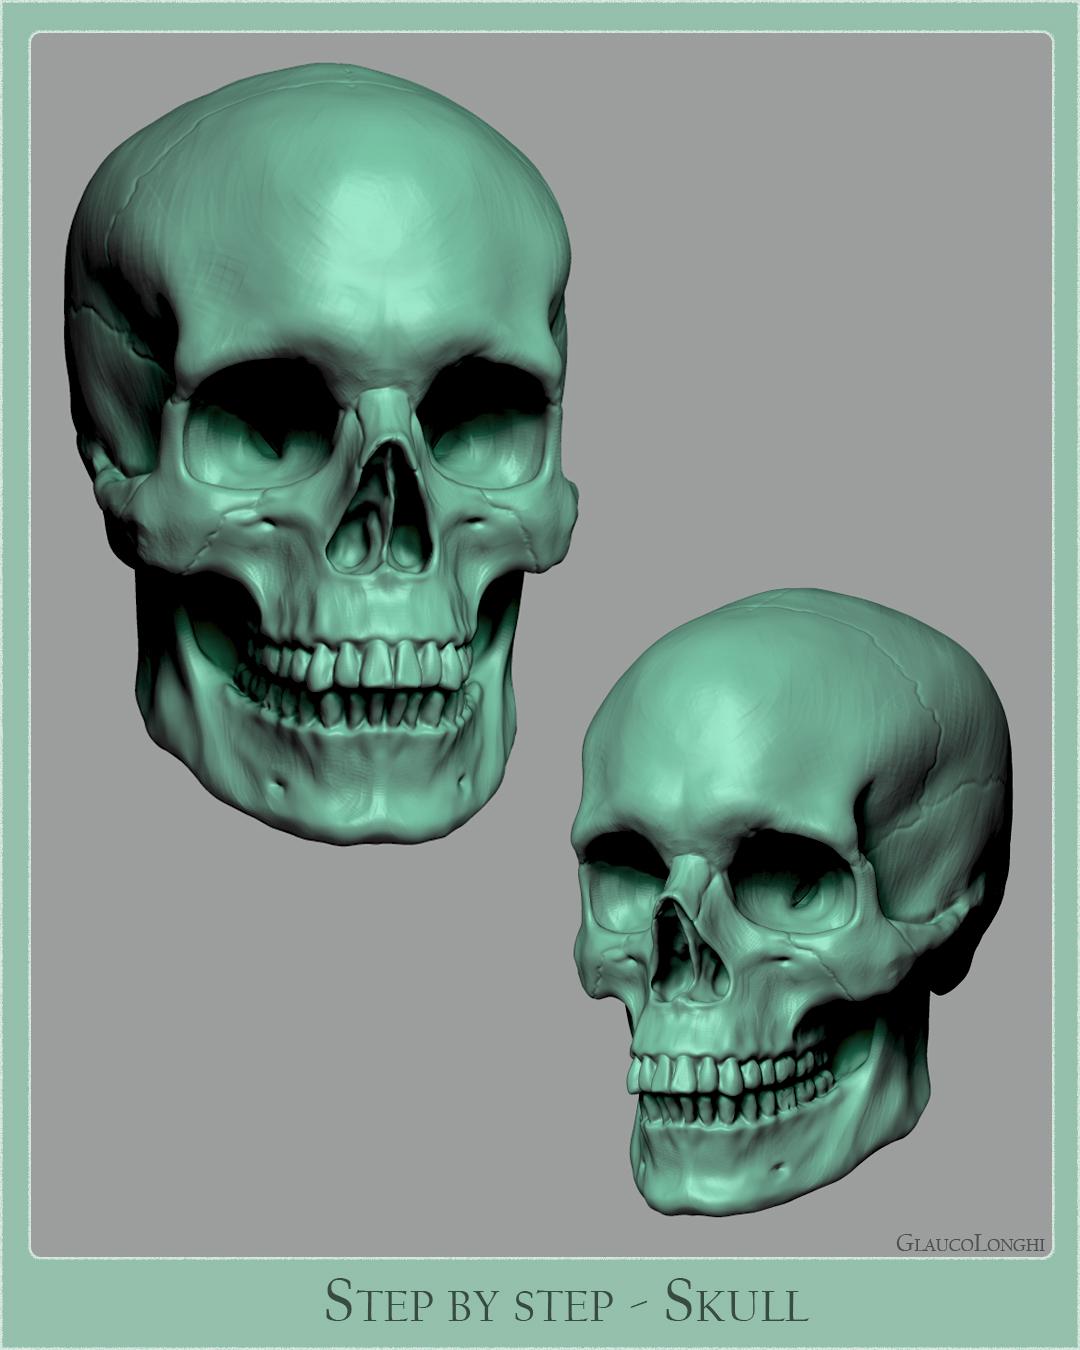 sbs_skull_05.jpg